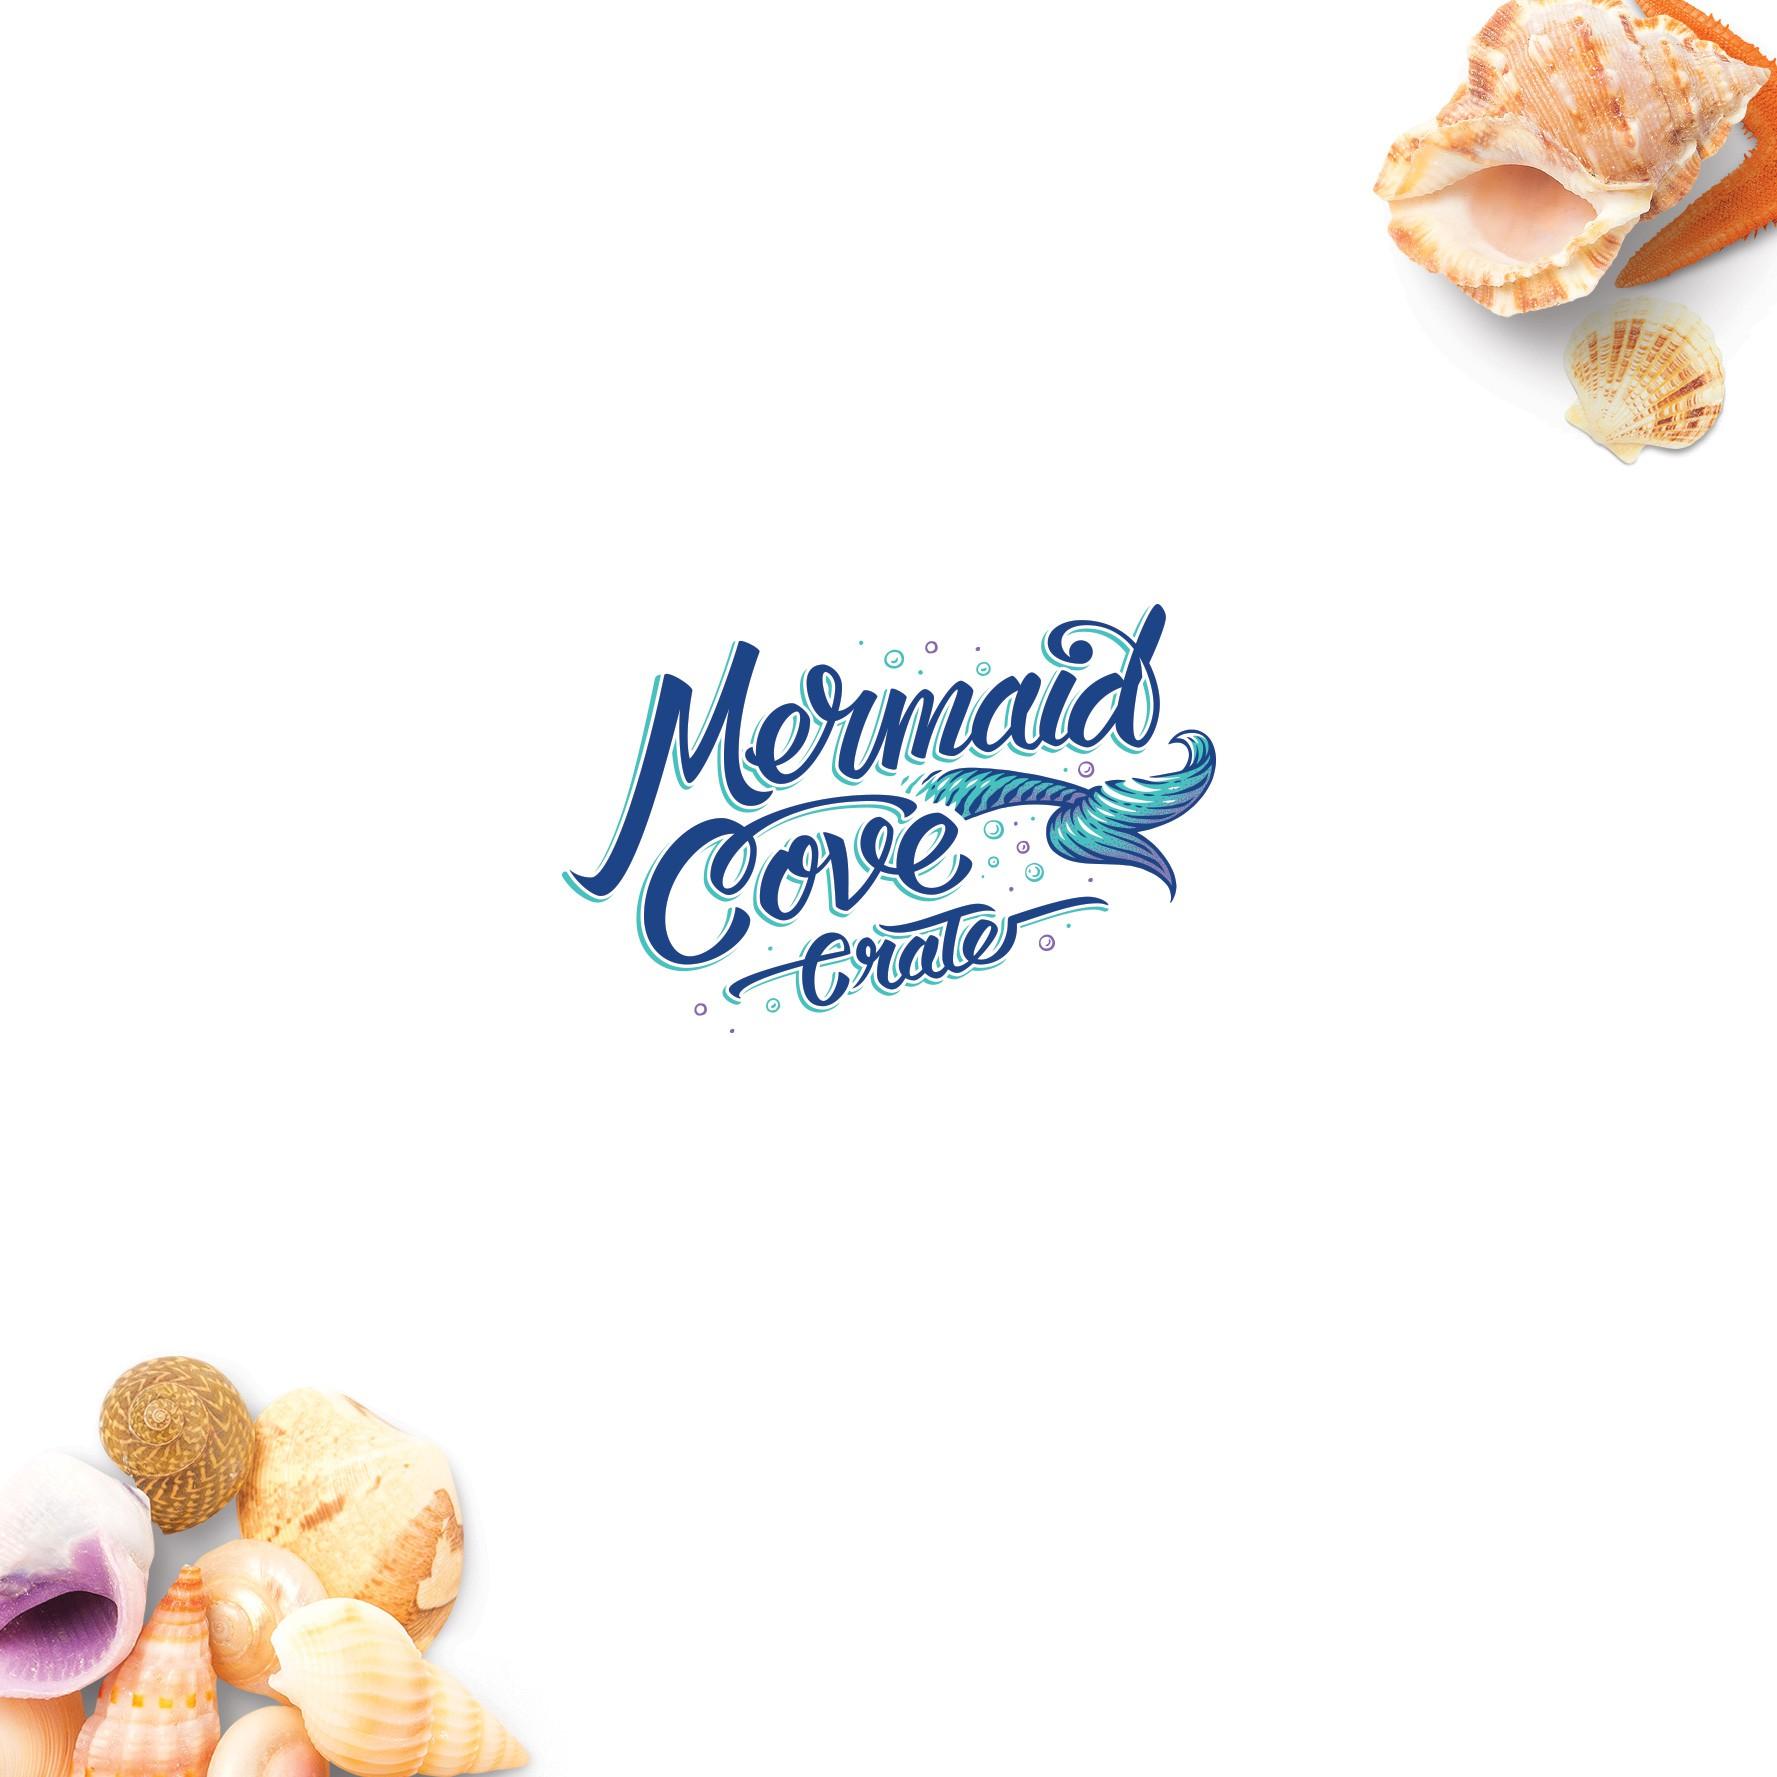 Mermaid Cove Crate